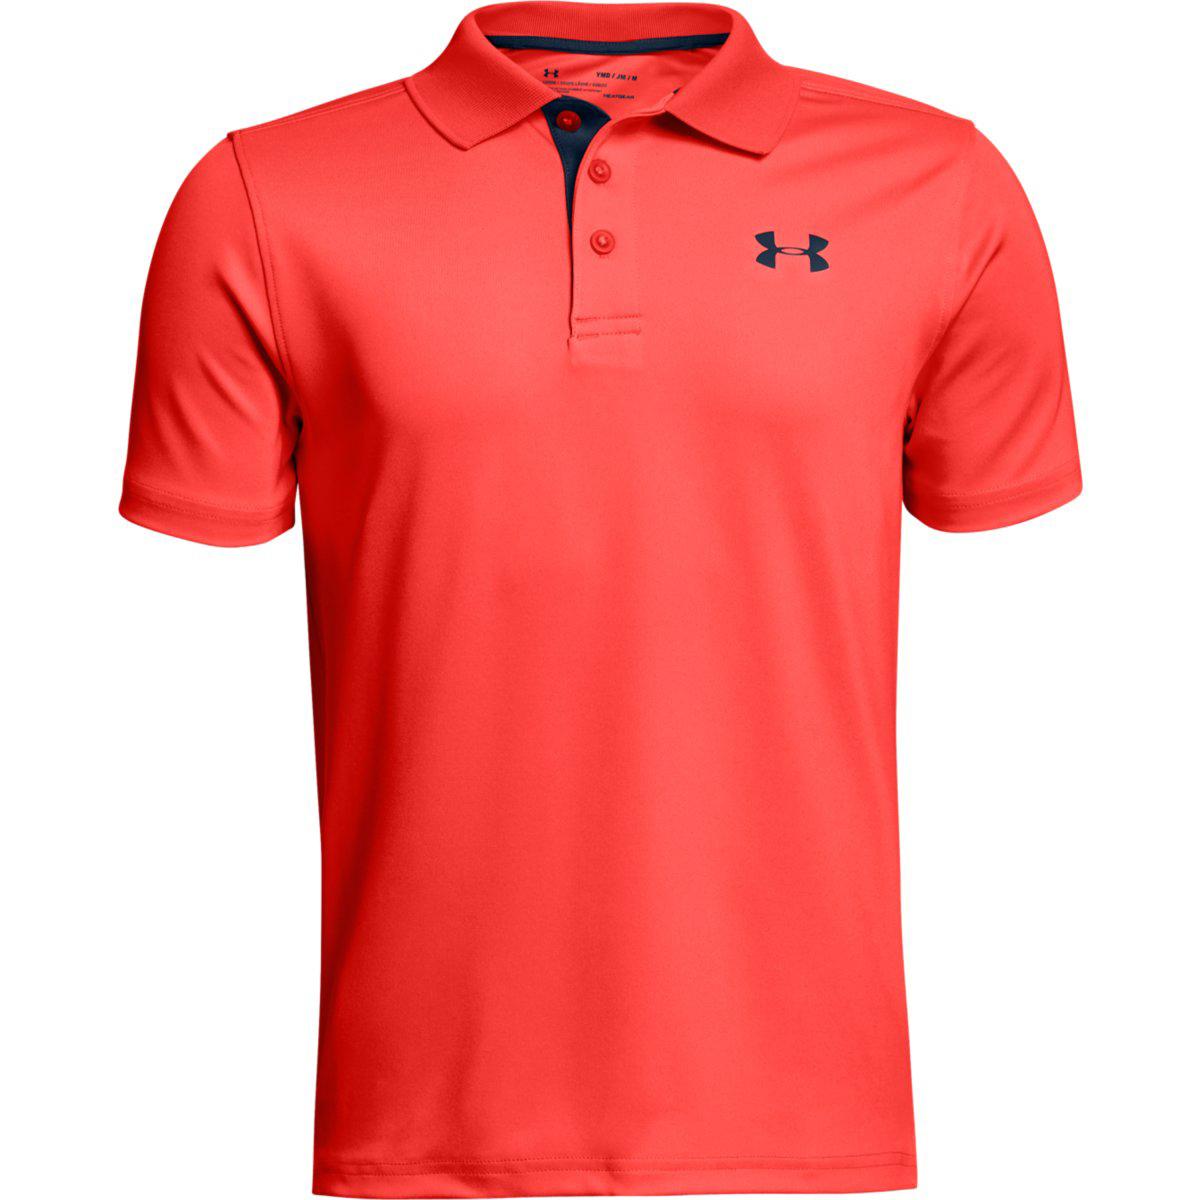 Under Armour Boys' Performance Polo Short-Sleeve Shirt - Orange, XL